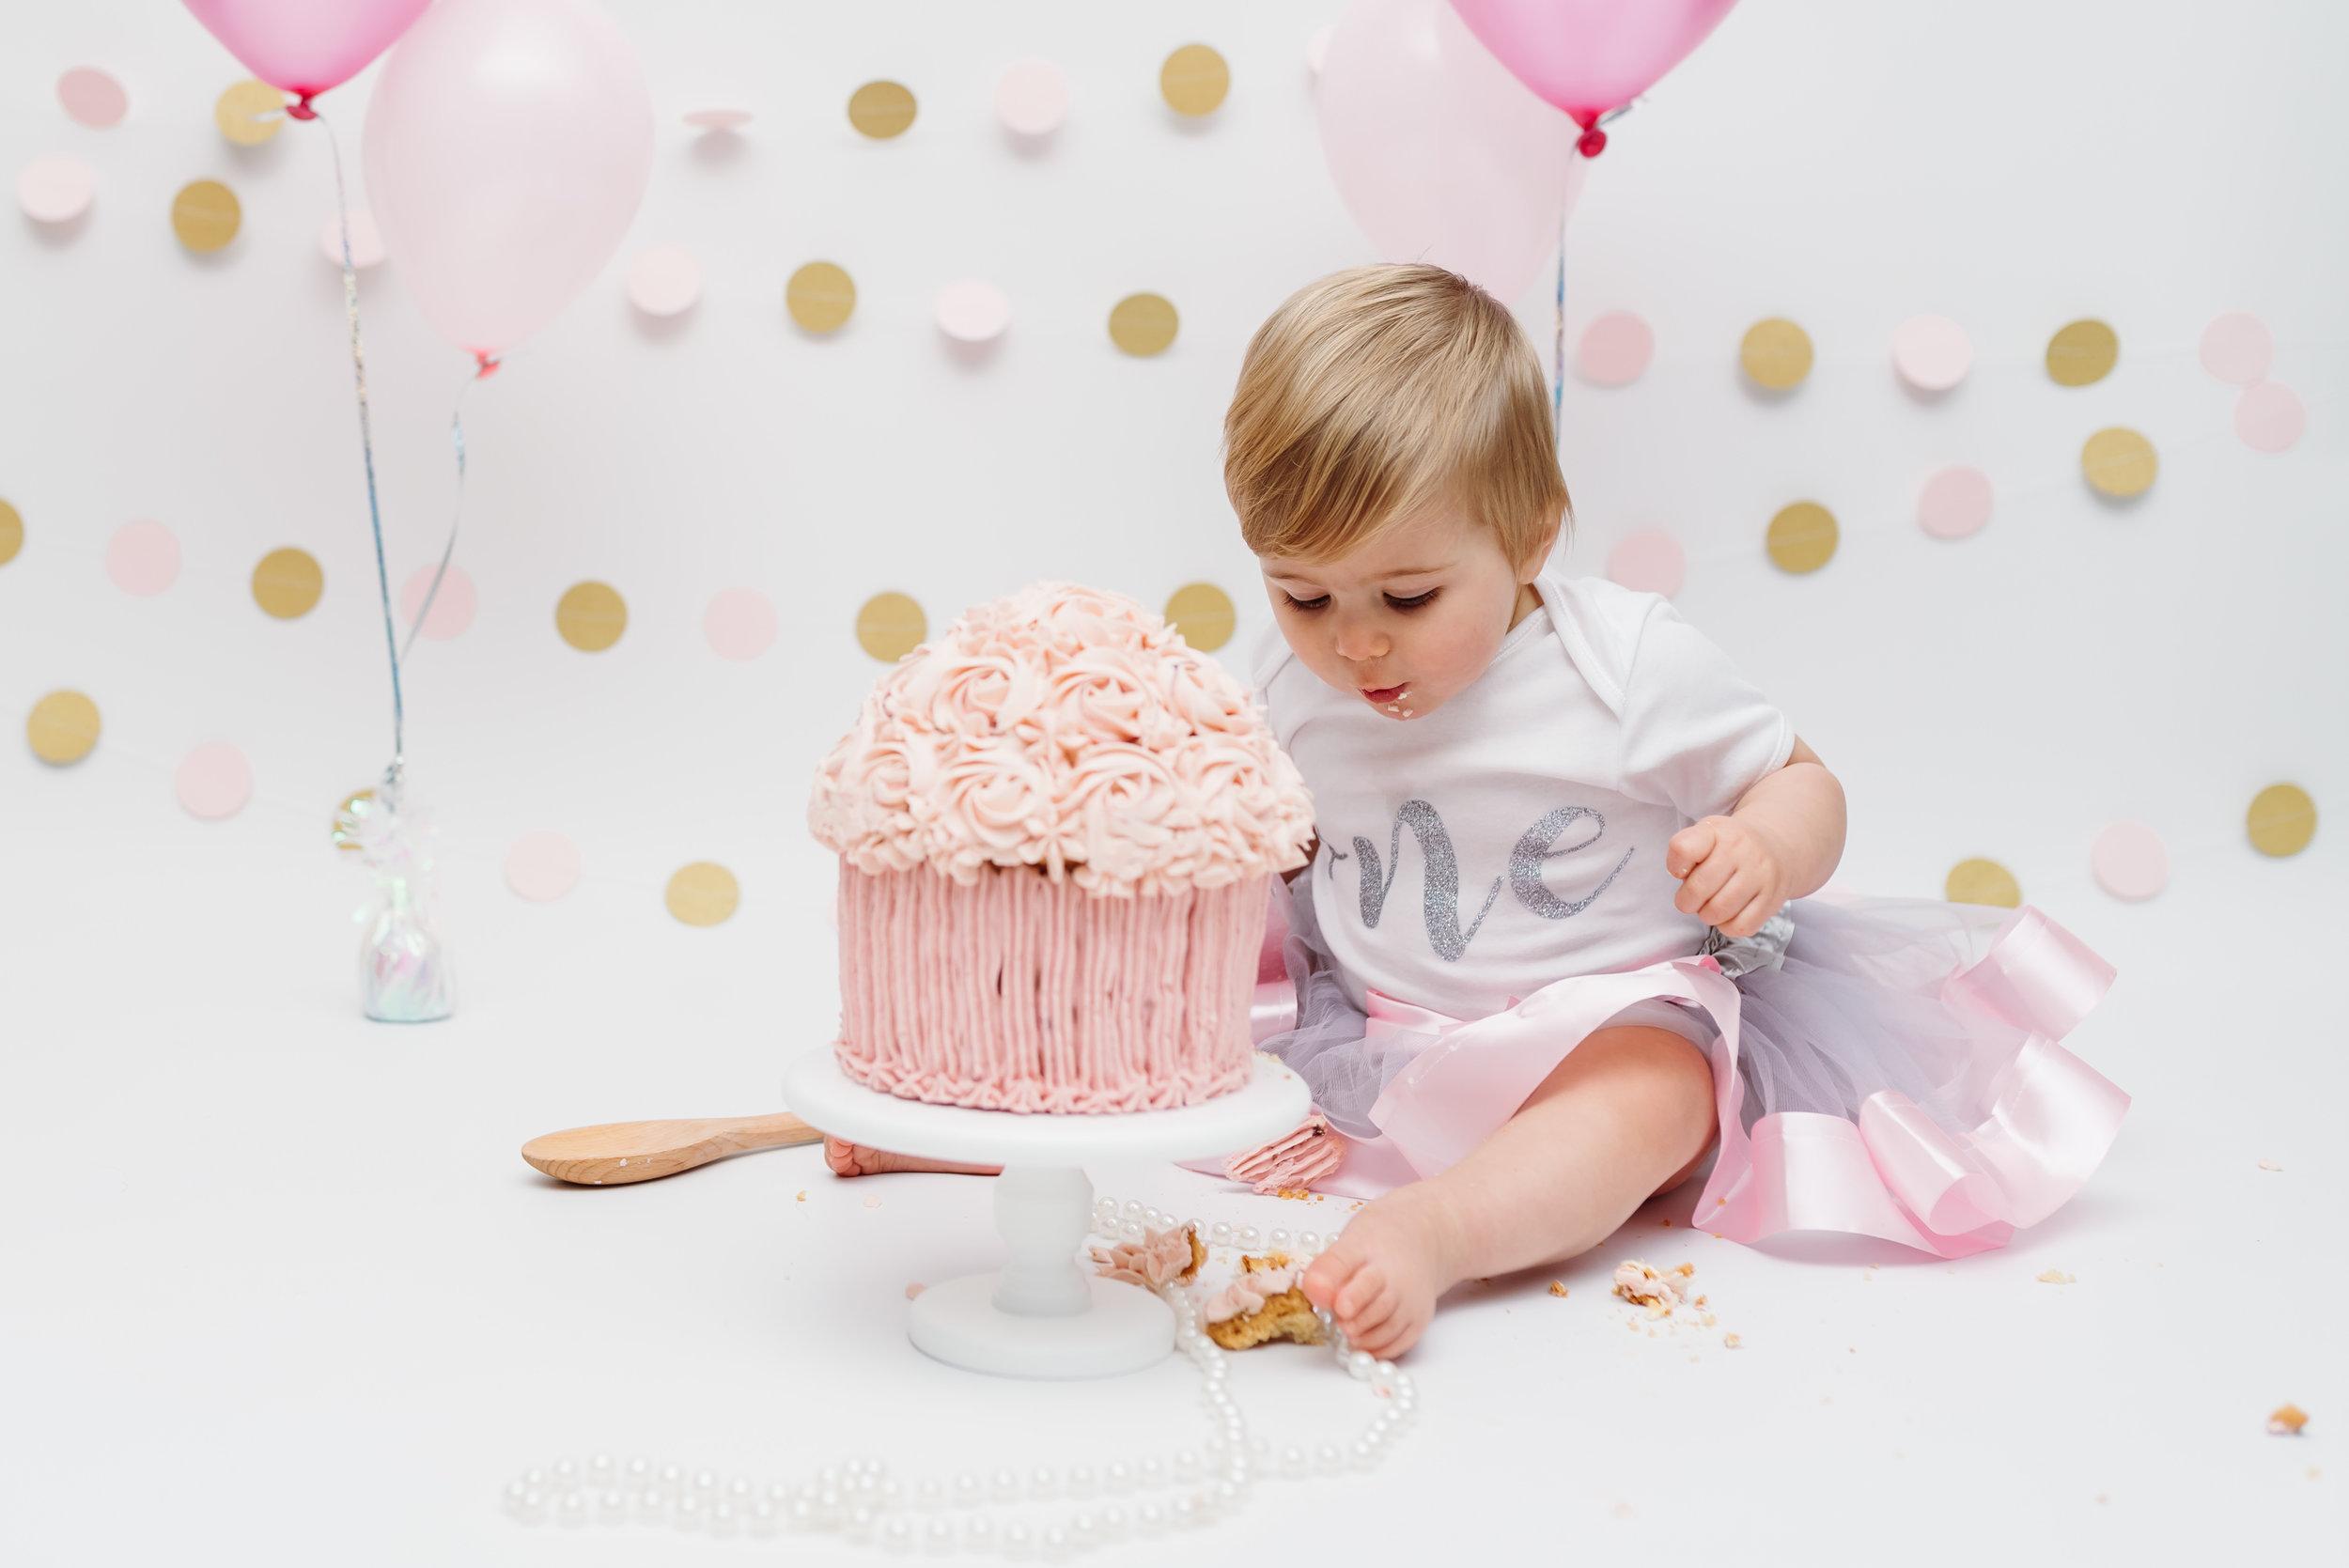 Birthday girl - cake smash and splash